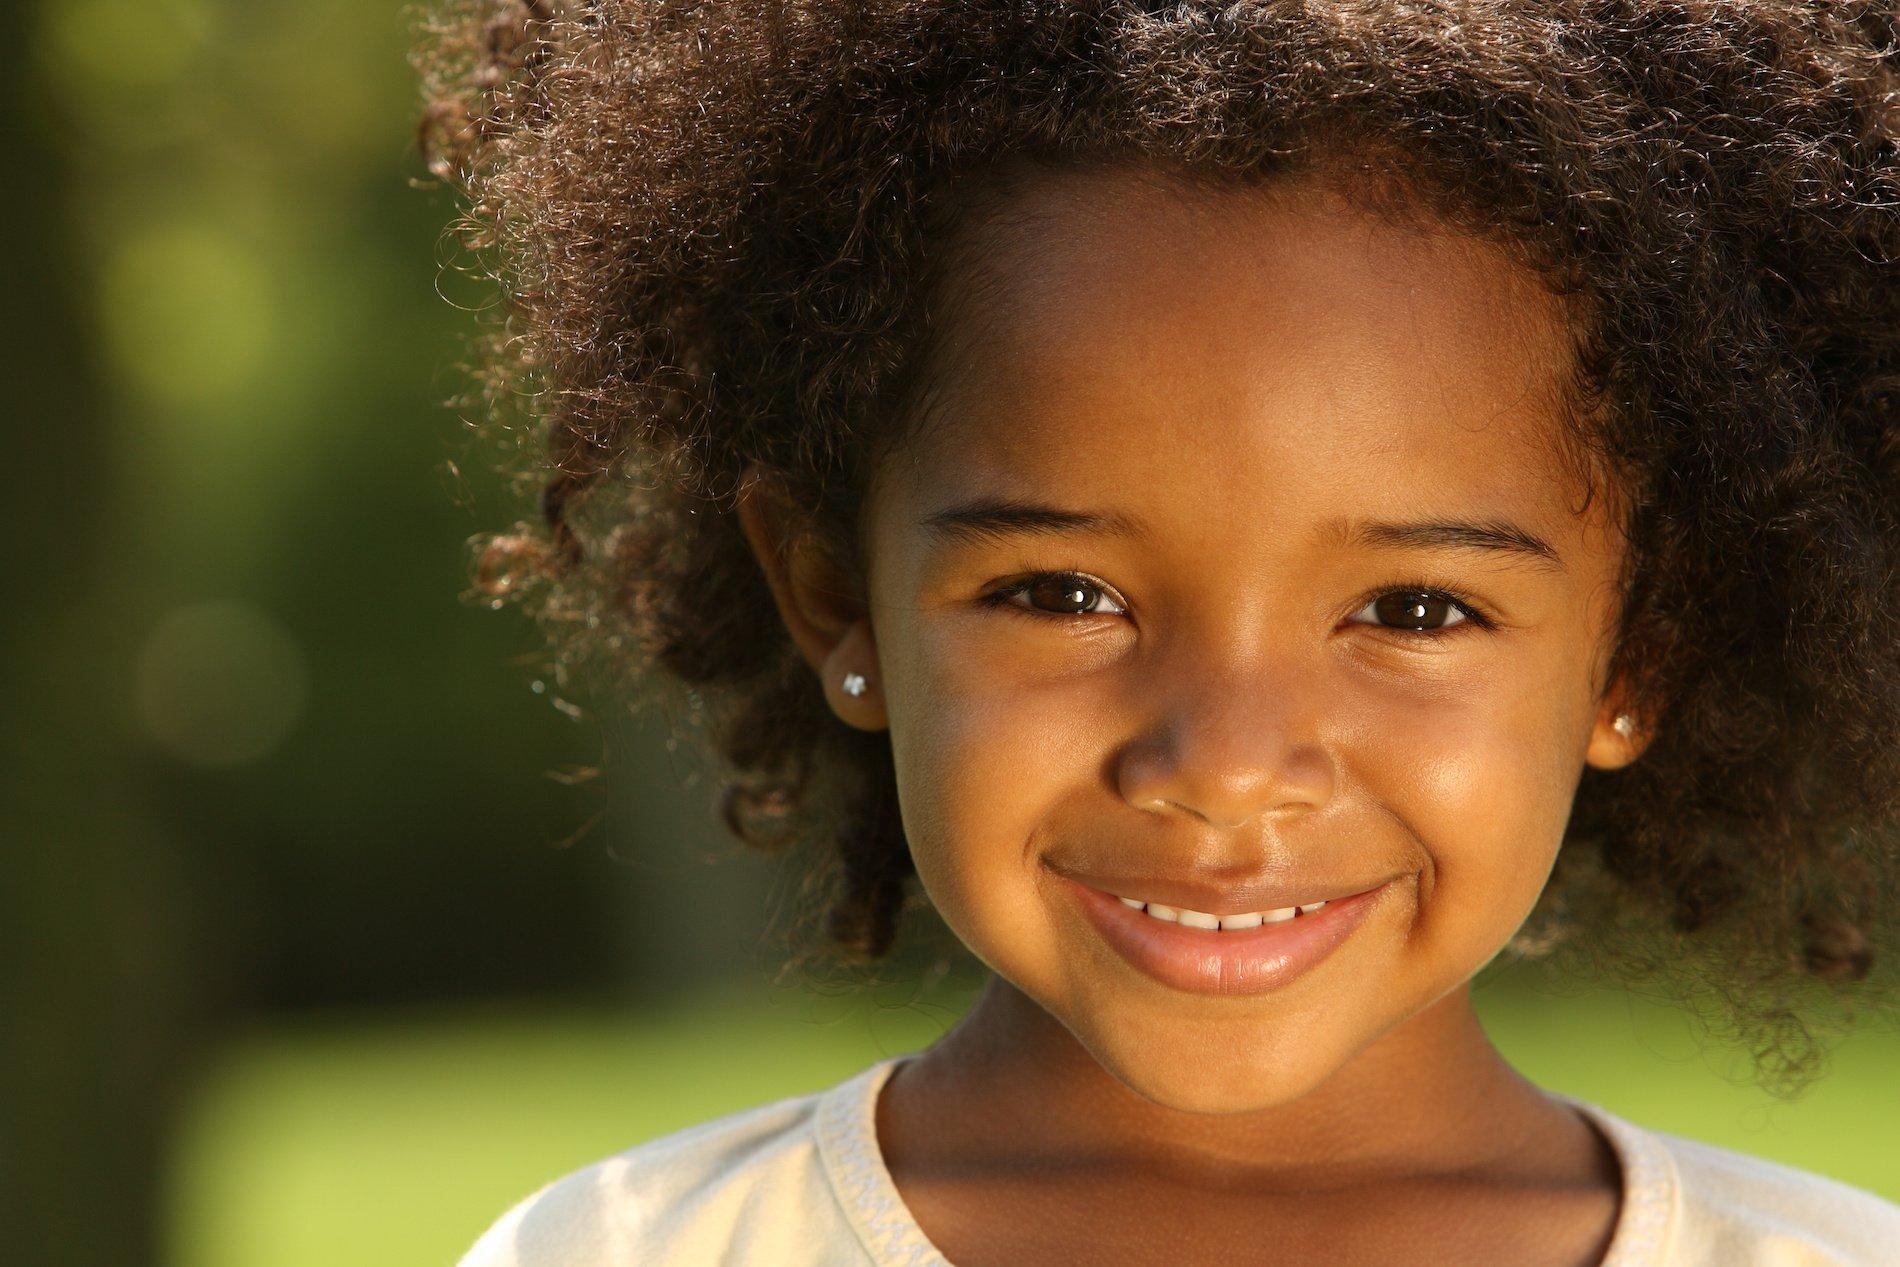 Jaw Growth Deformities Child Jaw Development PRECiDENT